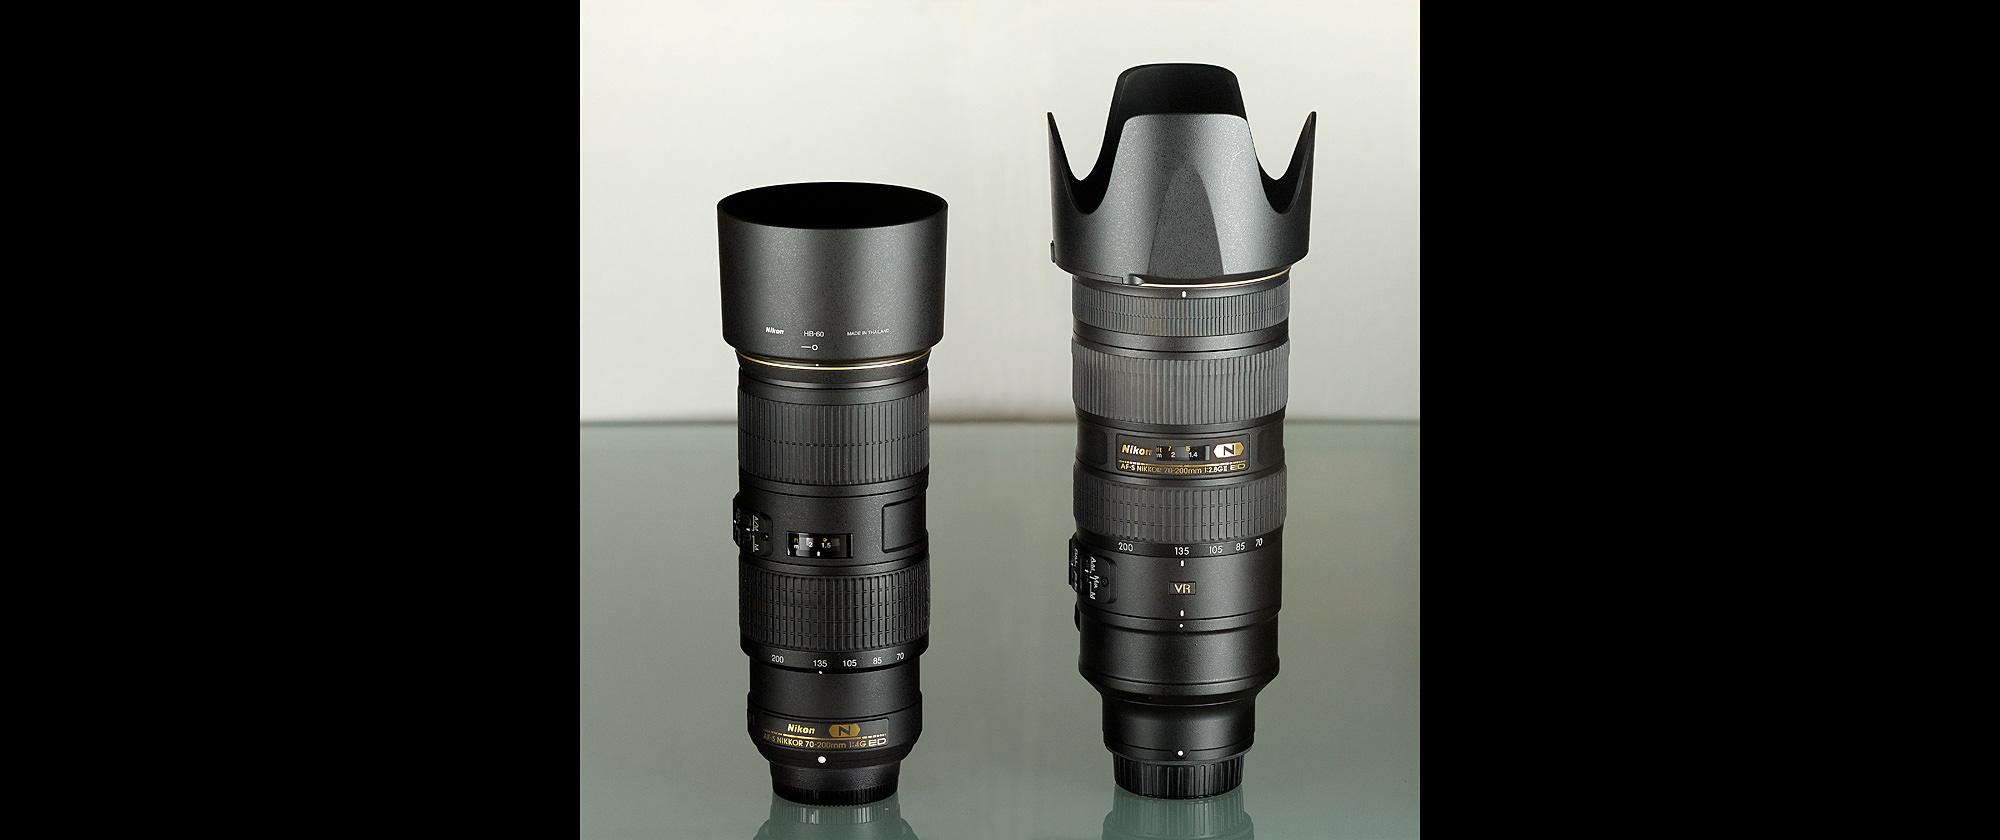 The Nikon 70-200 f/4G ED VR and the Nikon 70-200 f/2.8G ED VR